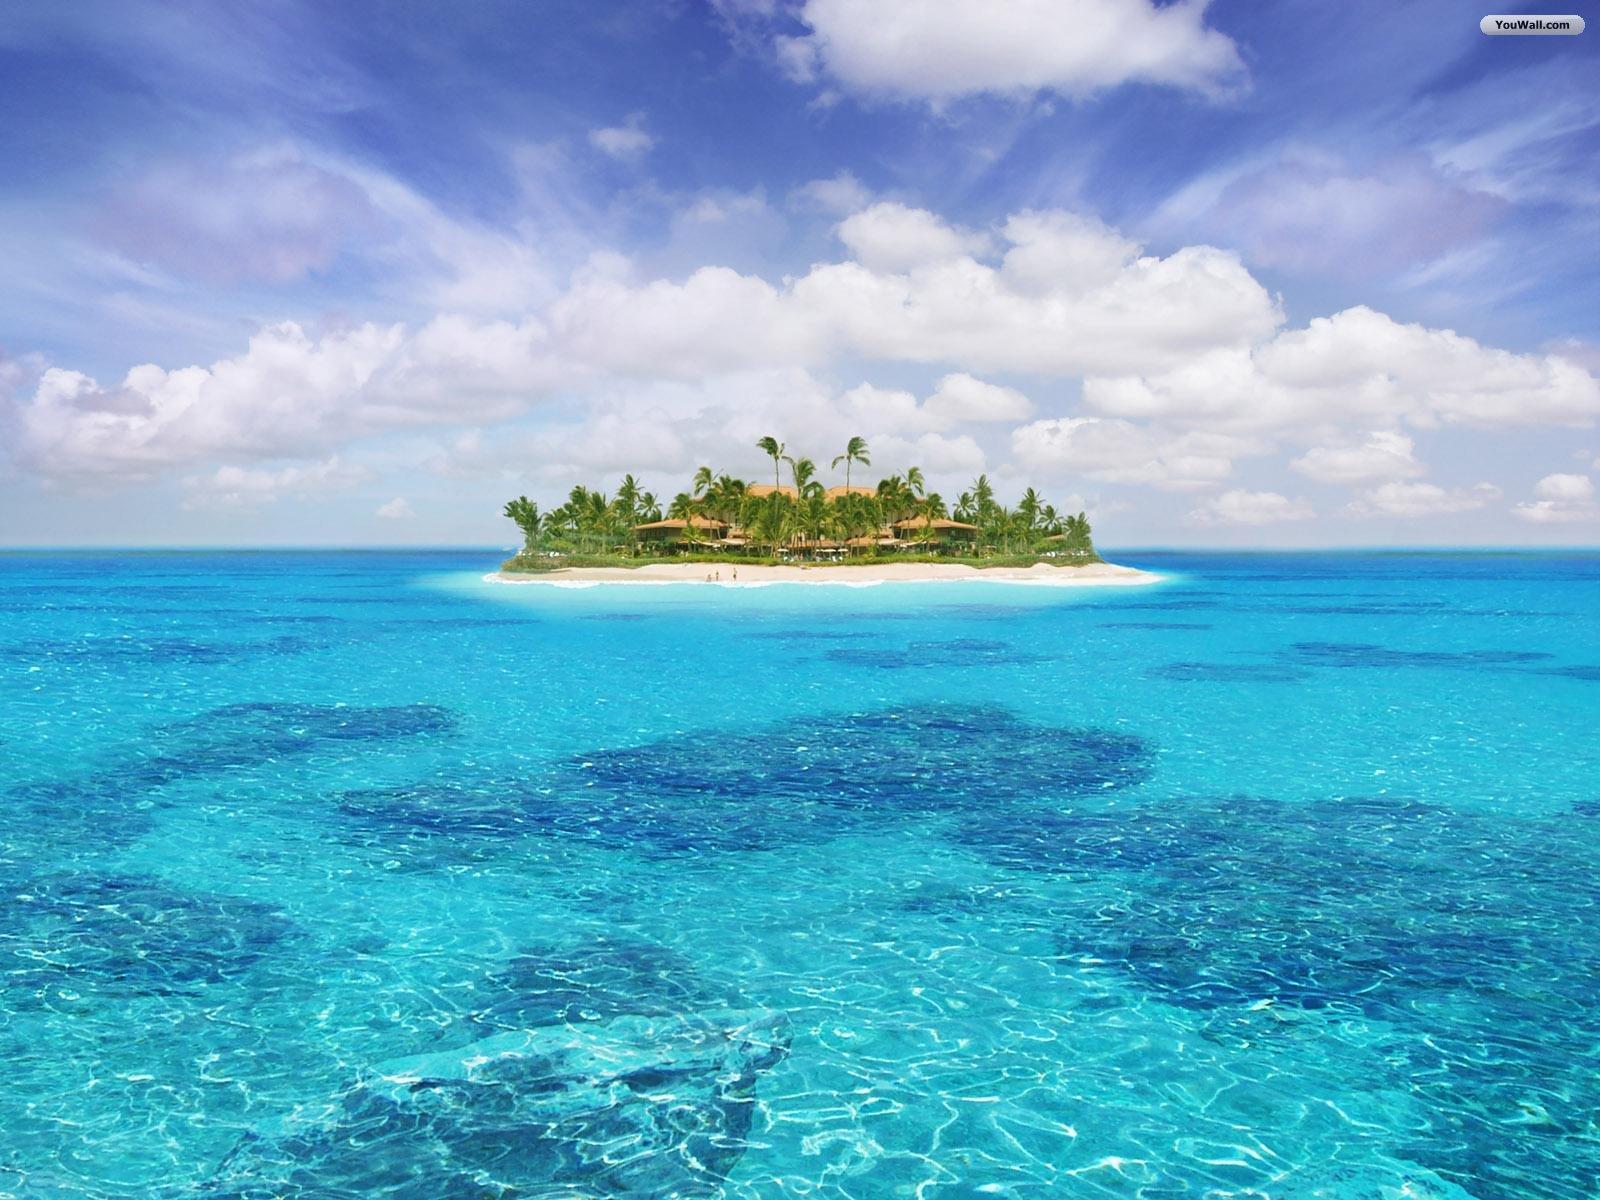 Island paradise wallpaper